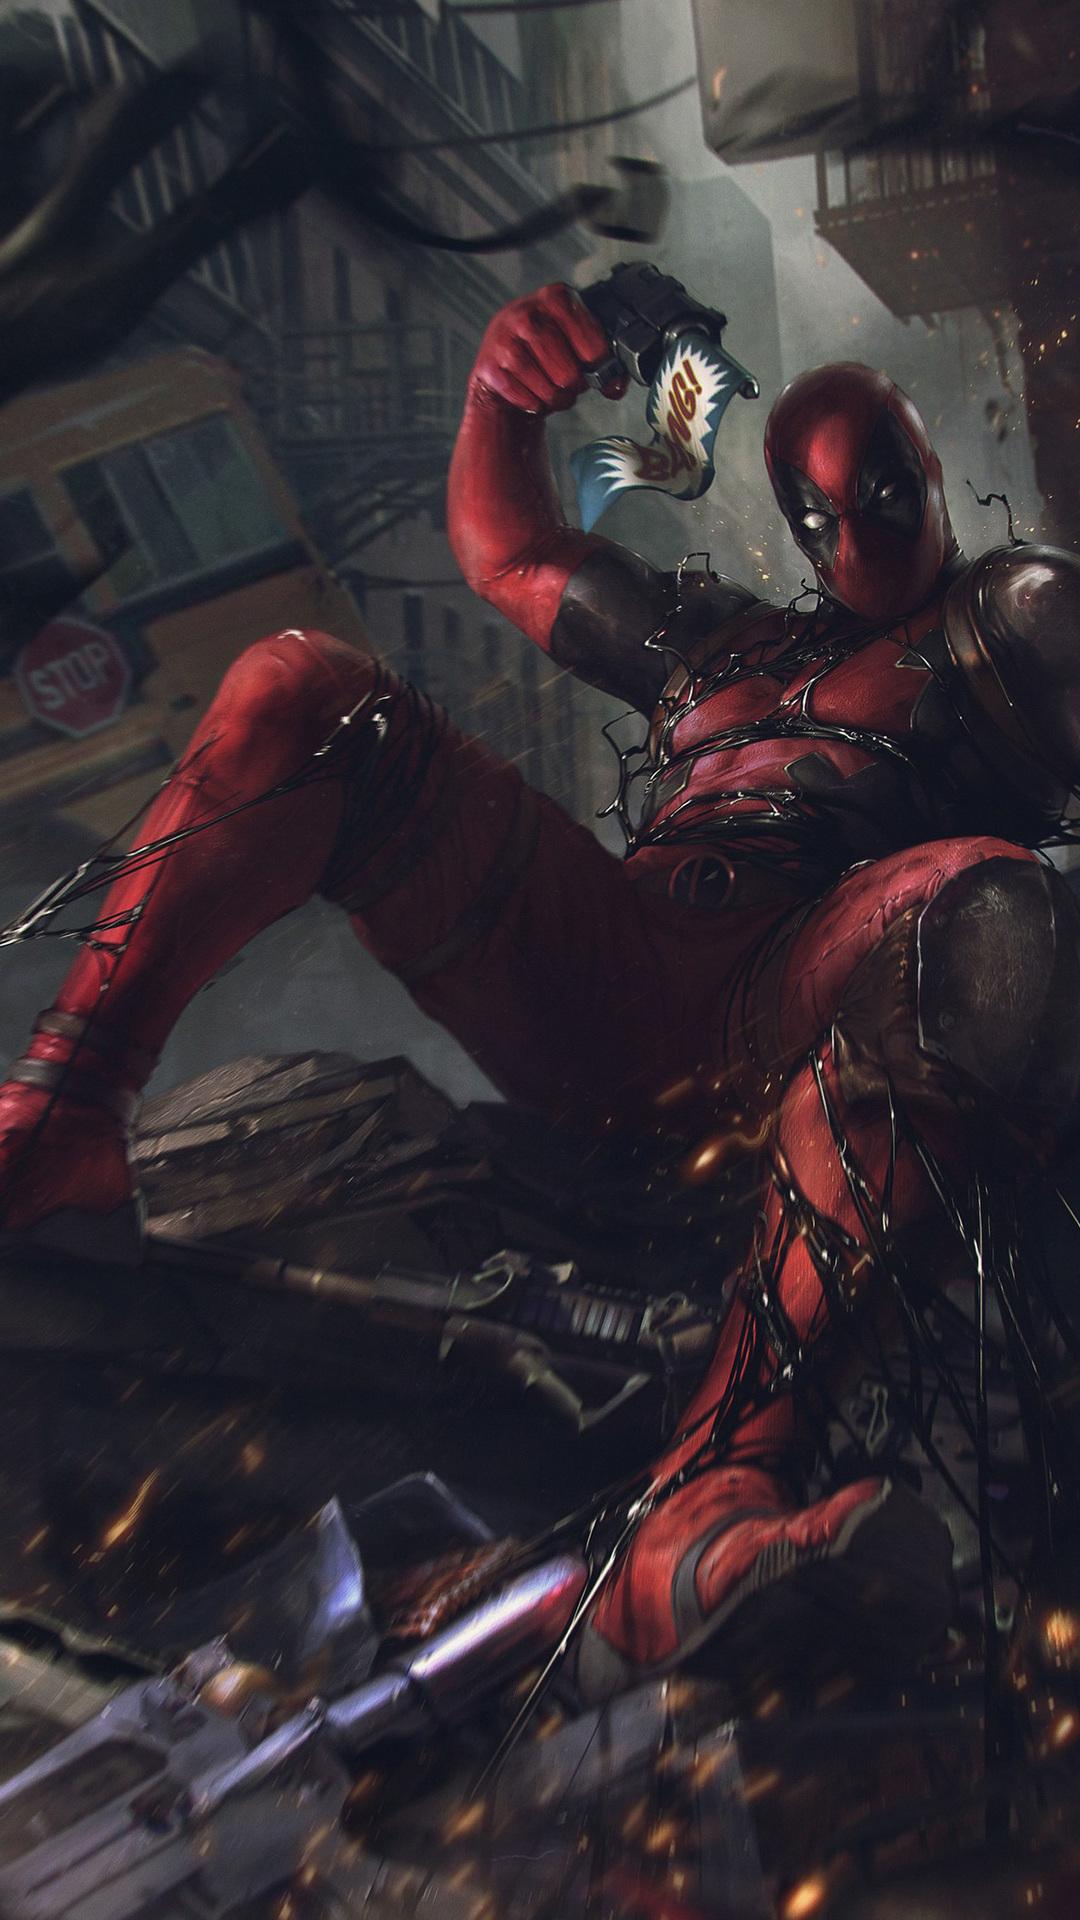 Deadpool Iphone Wallpaper Cute 1080x1920 Deadpool Vs Venom Symbiote Iphone 7 6s 6 Plus